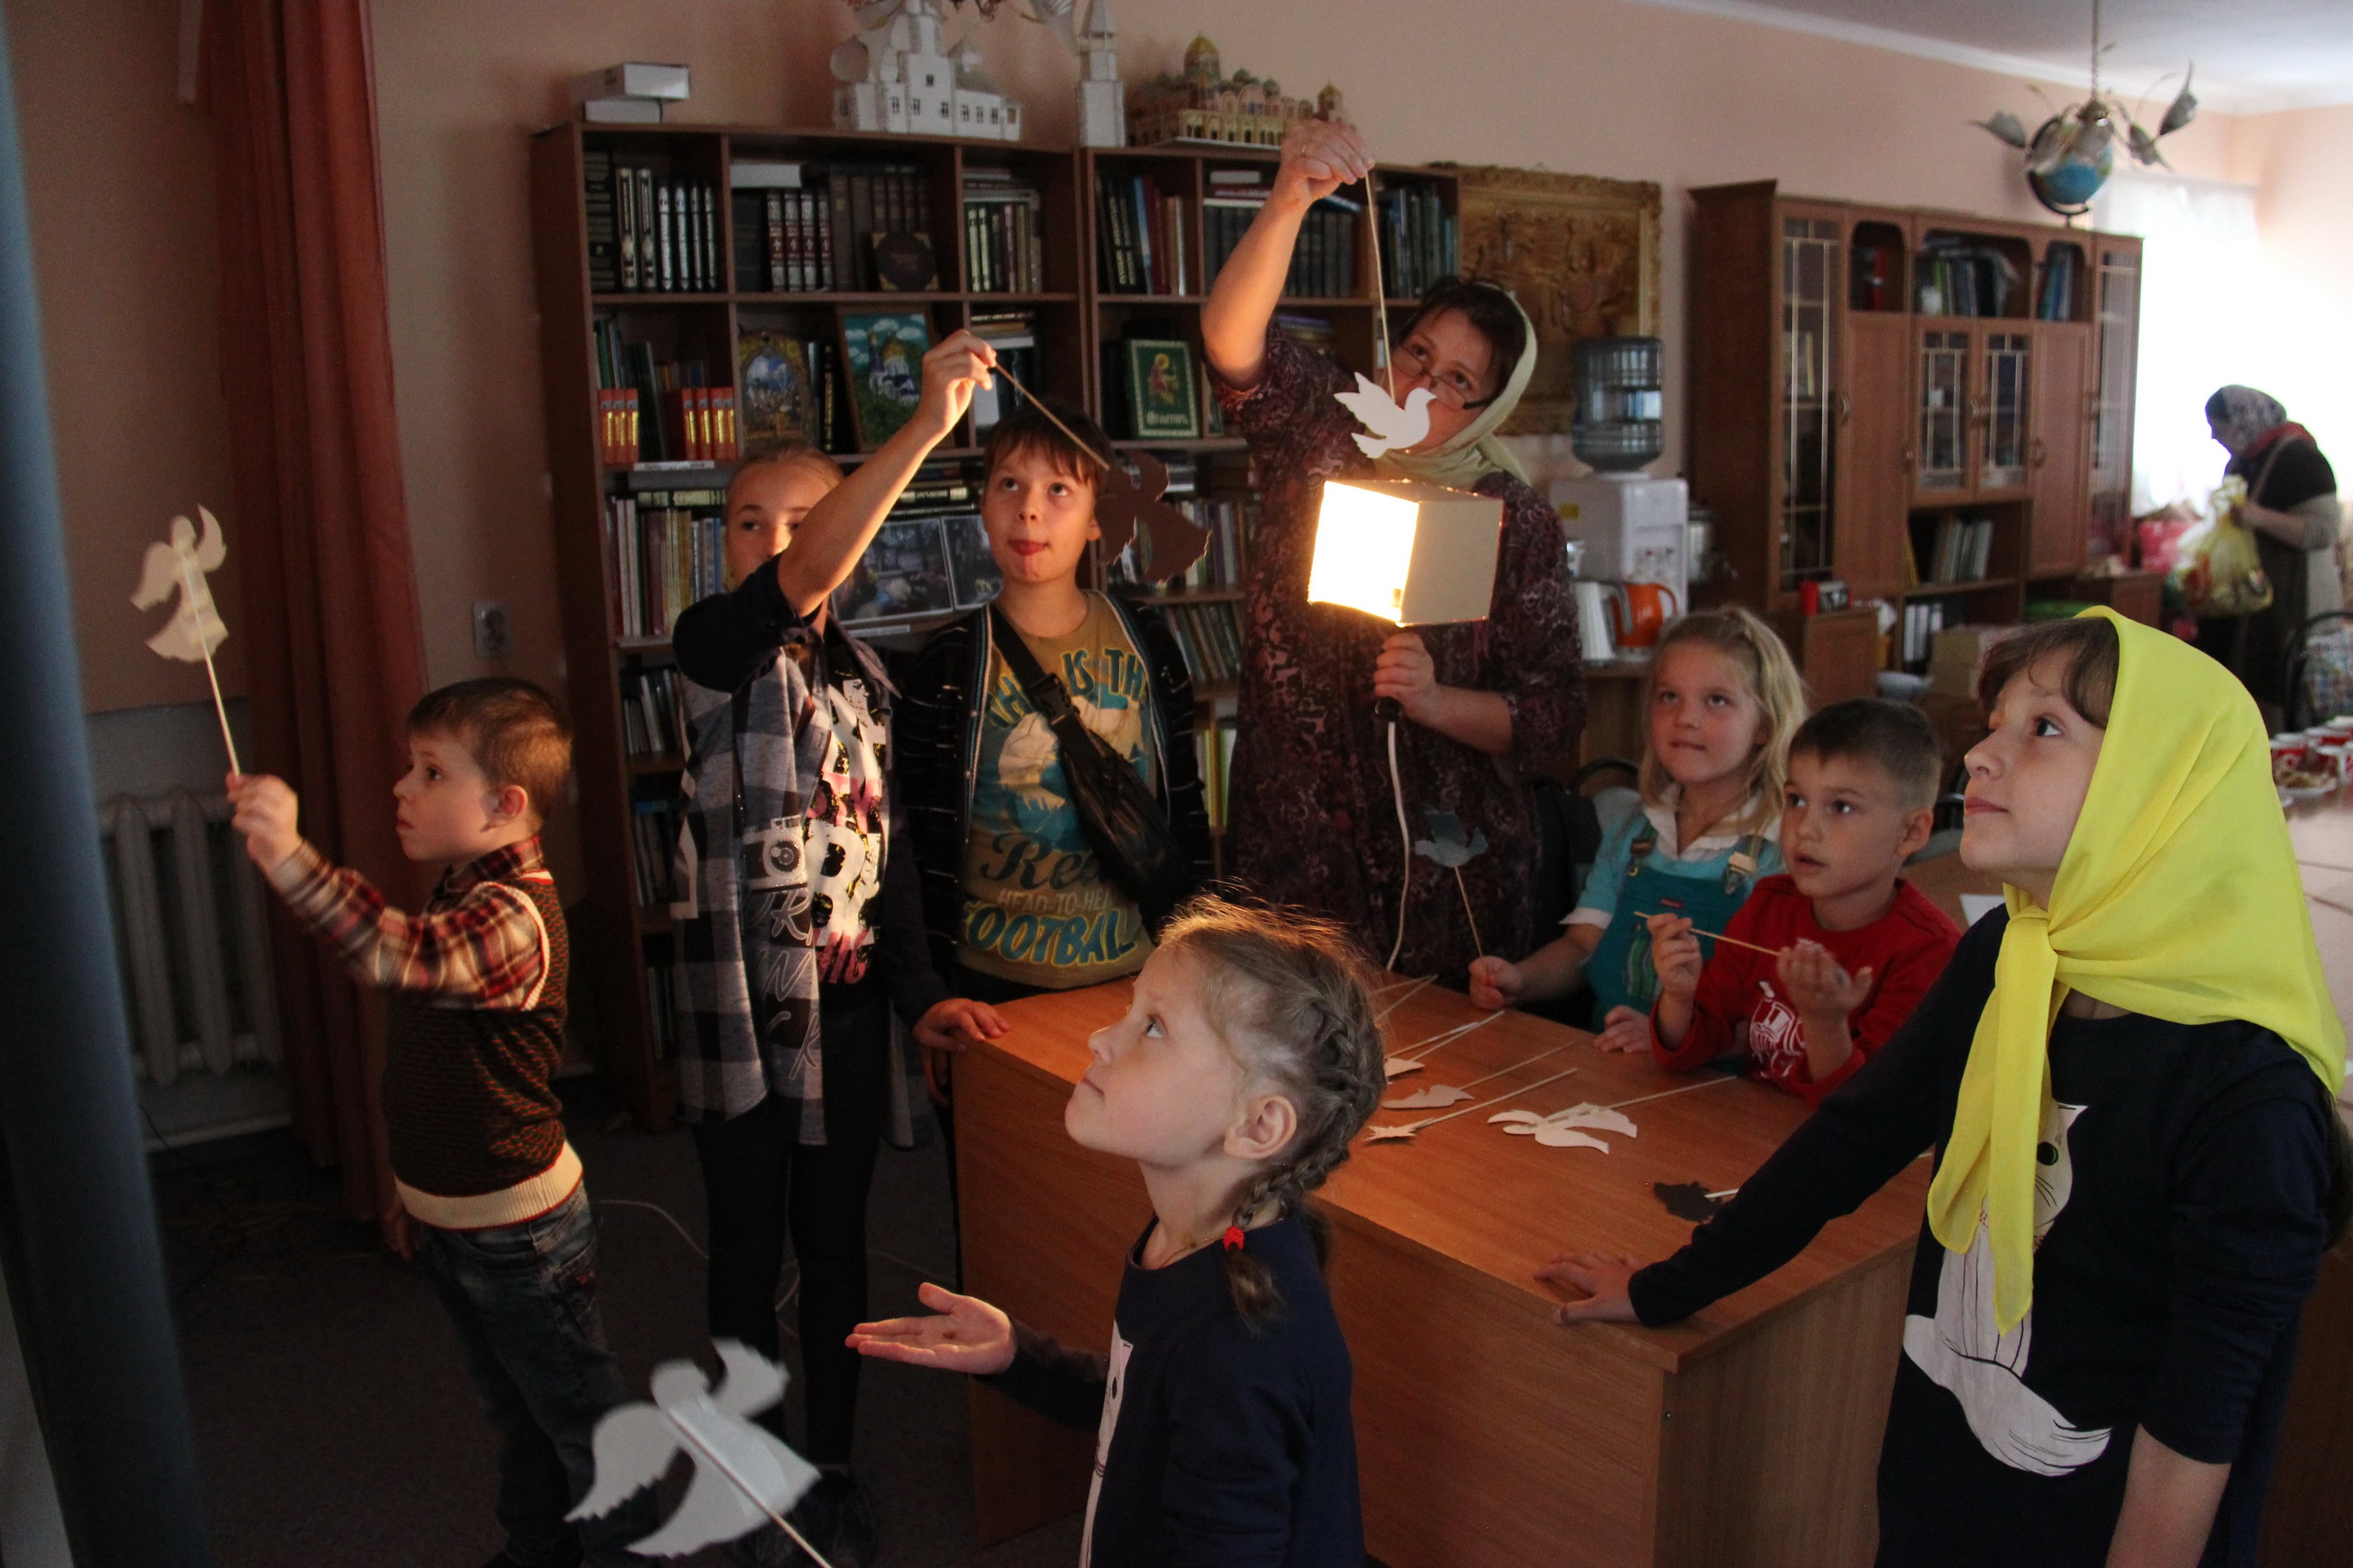 http://monuspen.ru/photoreports/eb4c15d9fc3c28084eb1366605361bfc.JPG